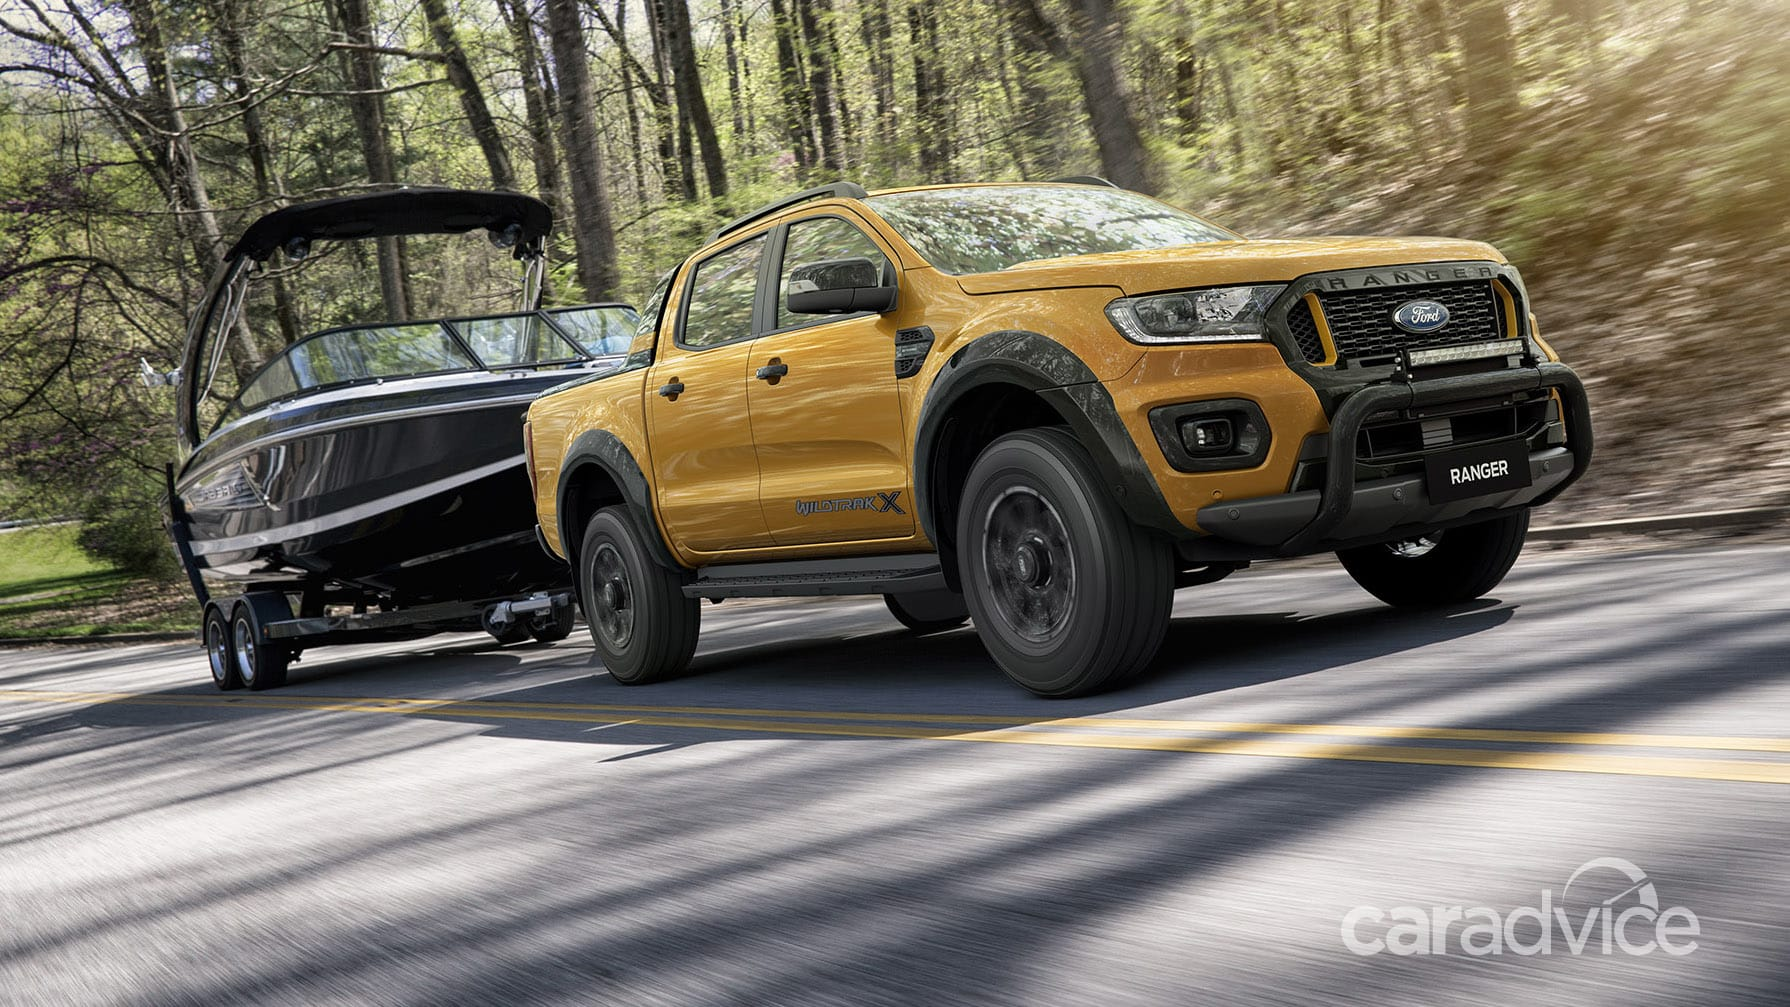 2021 ford ranger price and specs: wildtrak x returns